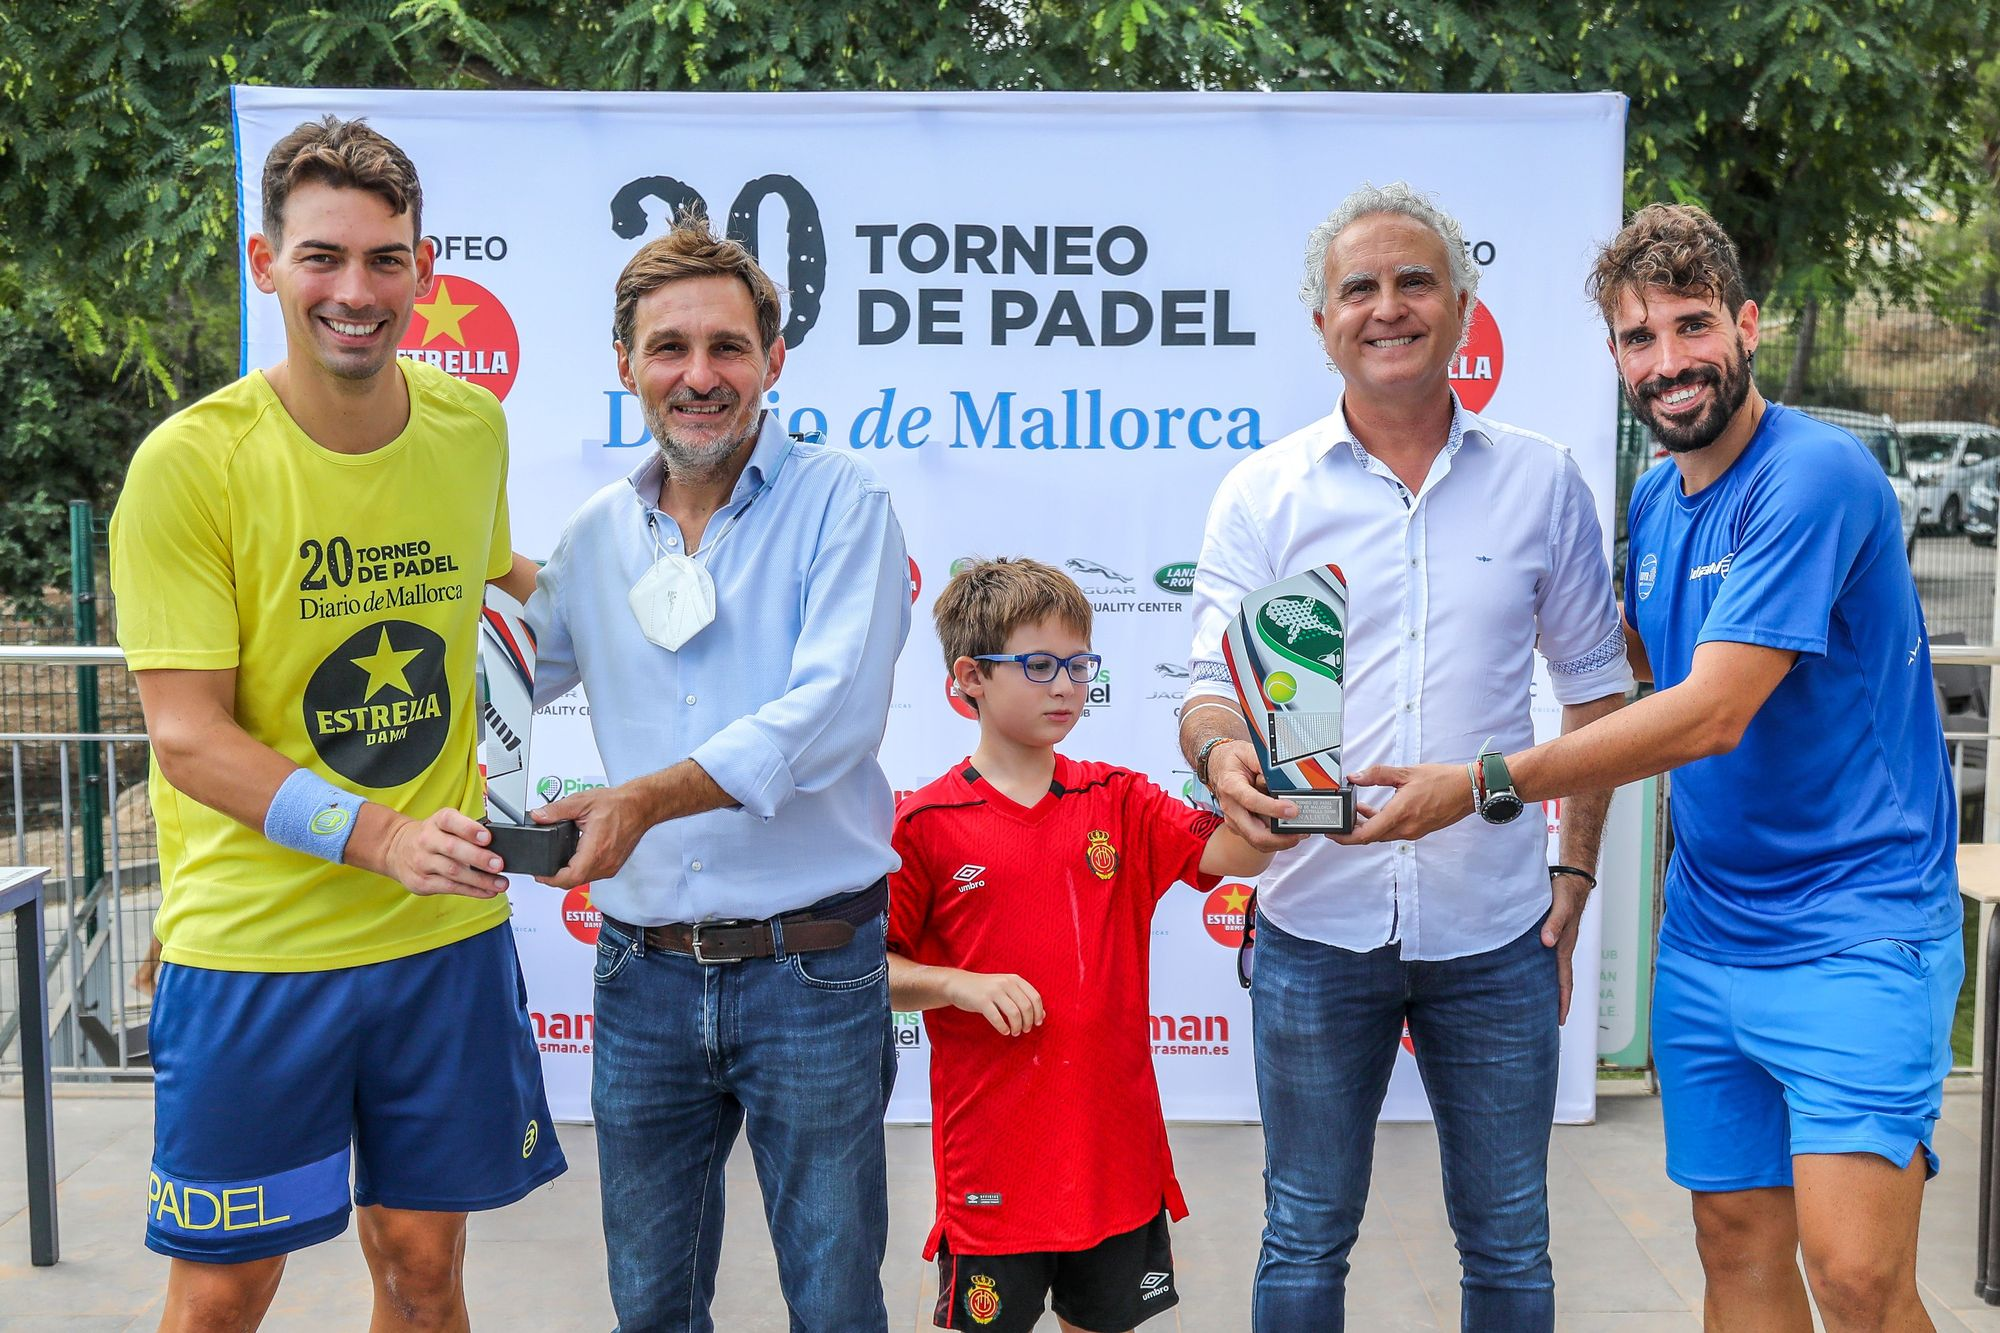 20 torneo Diario de Mallorca: Broche perfecto en Pins Pádel